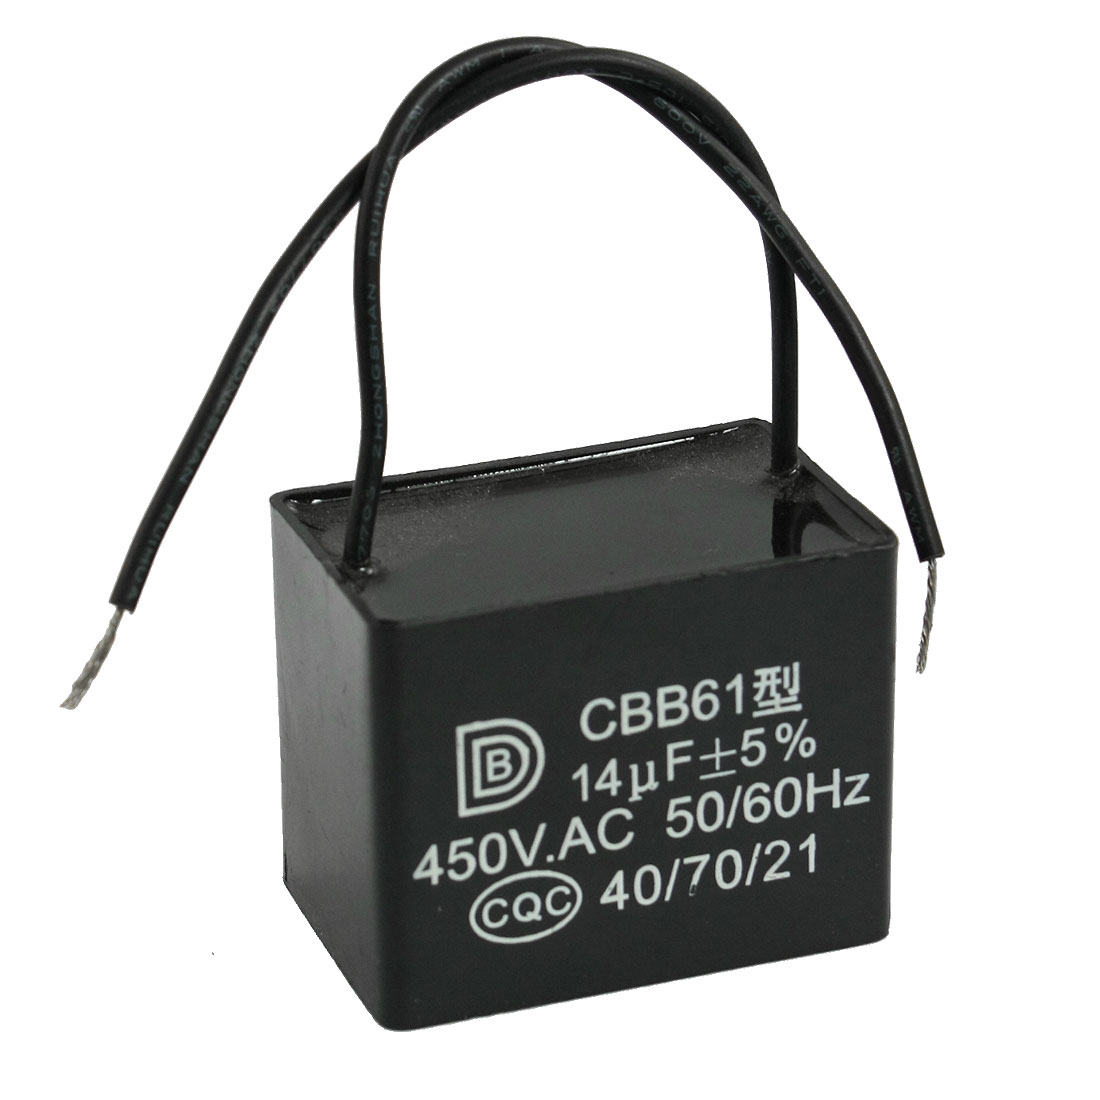 14uf 450VAC 50/60Hz 2 Wire Motor Run Fan Capacitor CBB61 Black